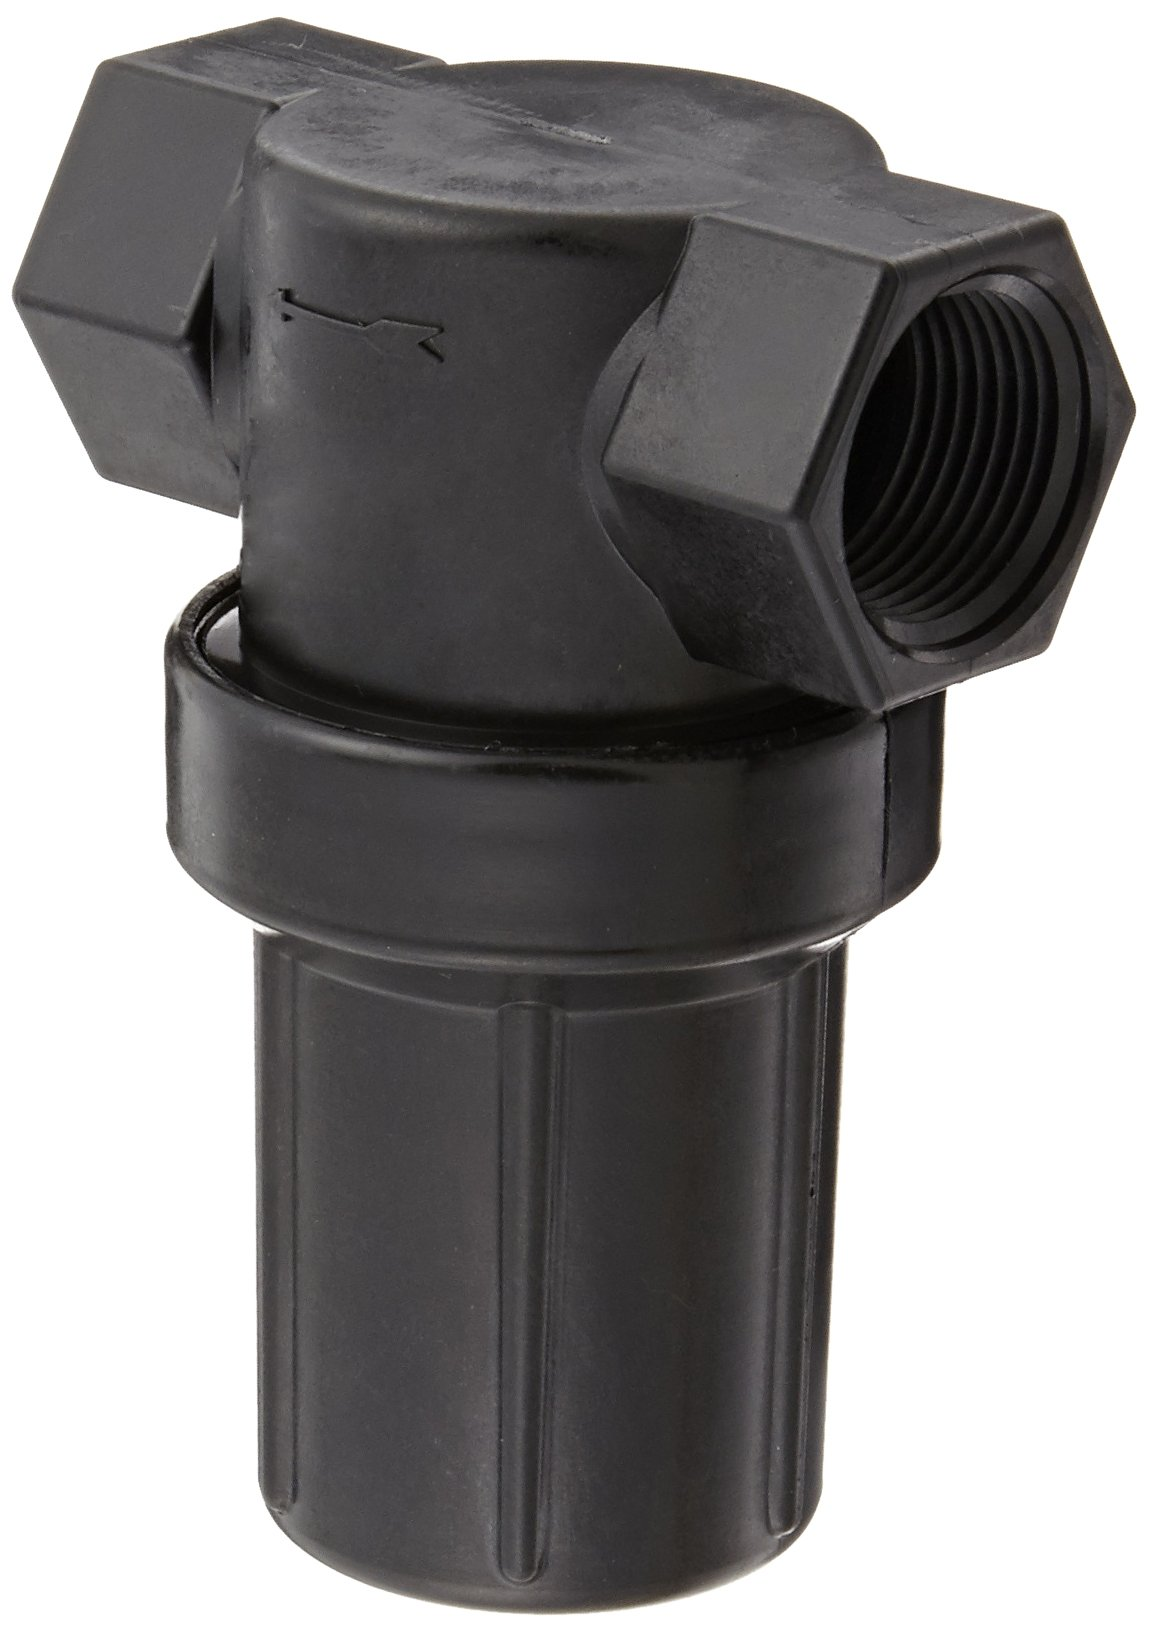 Banjo LSTM050-50C Polypropylene Mini T-Strainer with Clear Bowl 1//2 NPT Female 50 Mesh